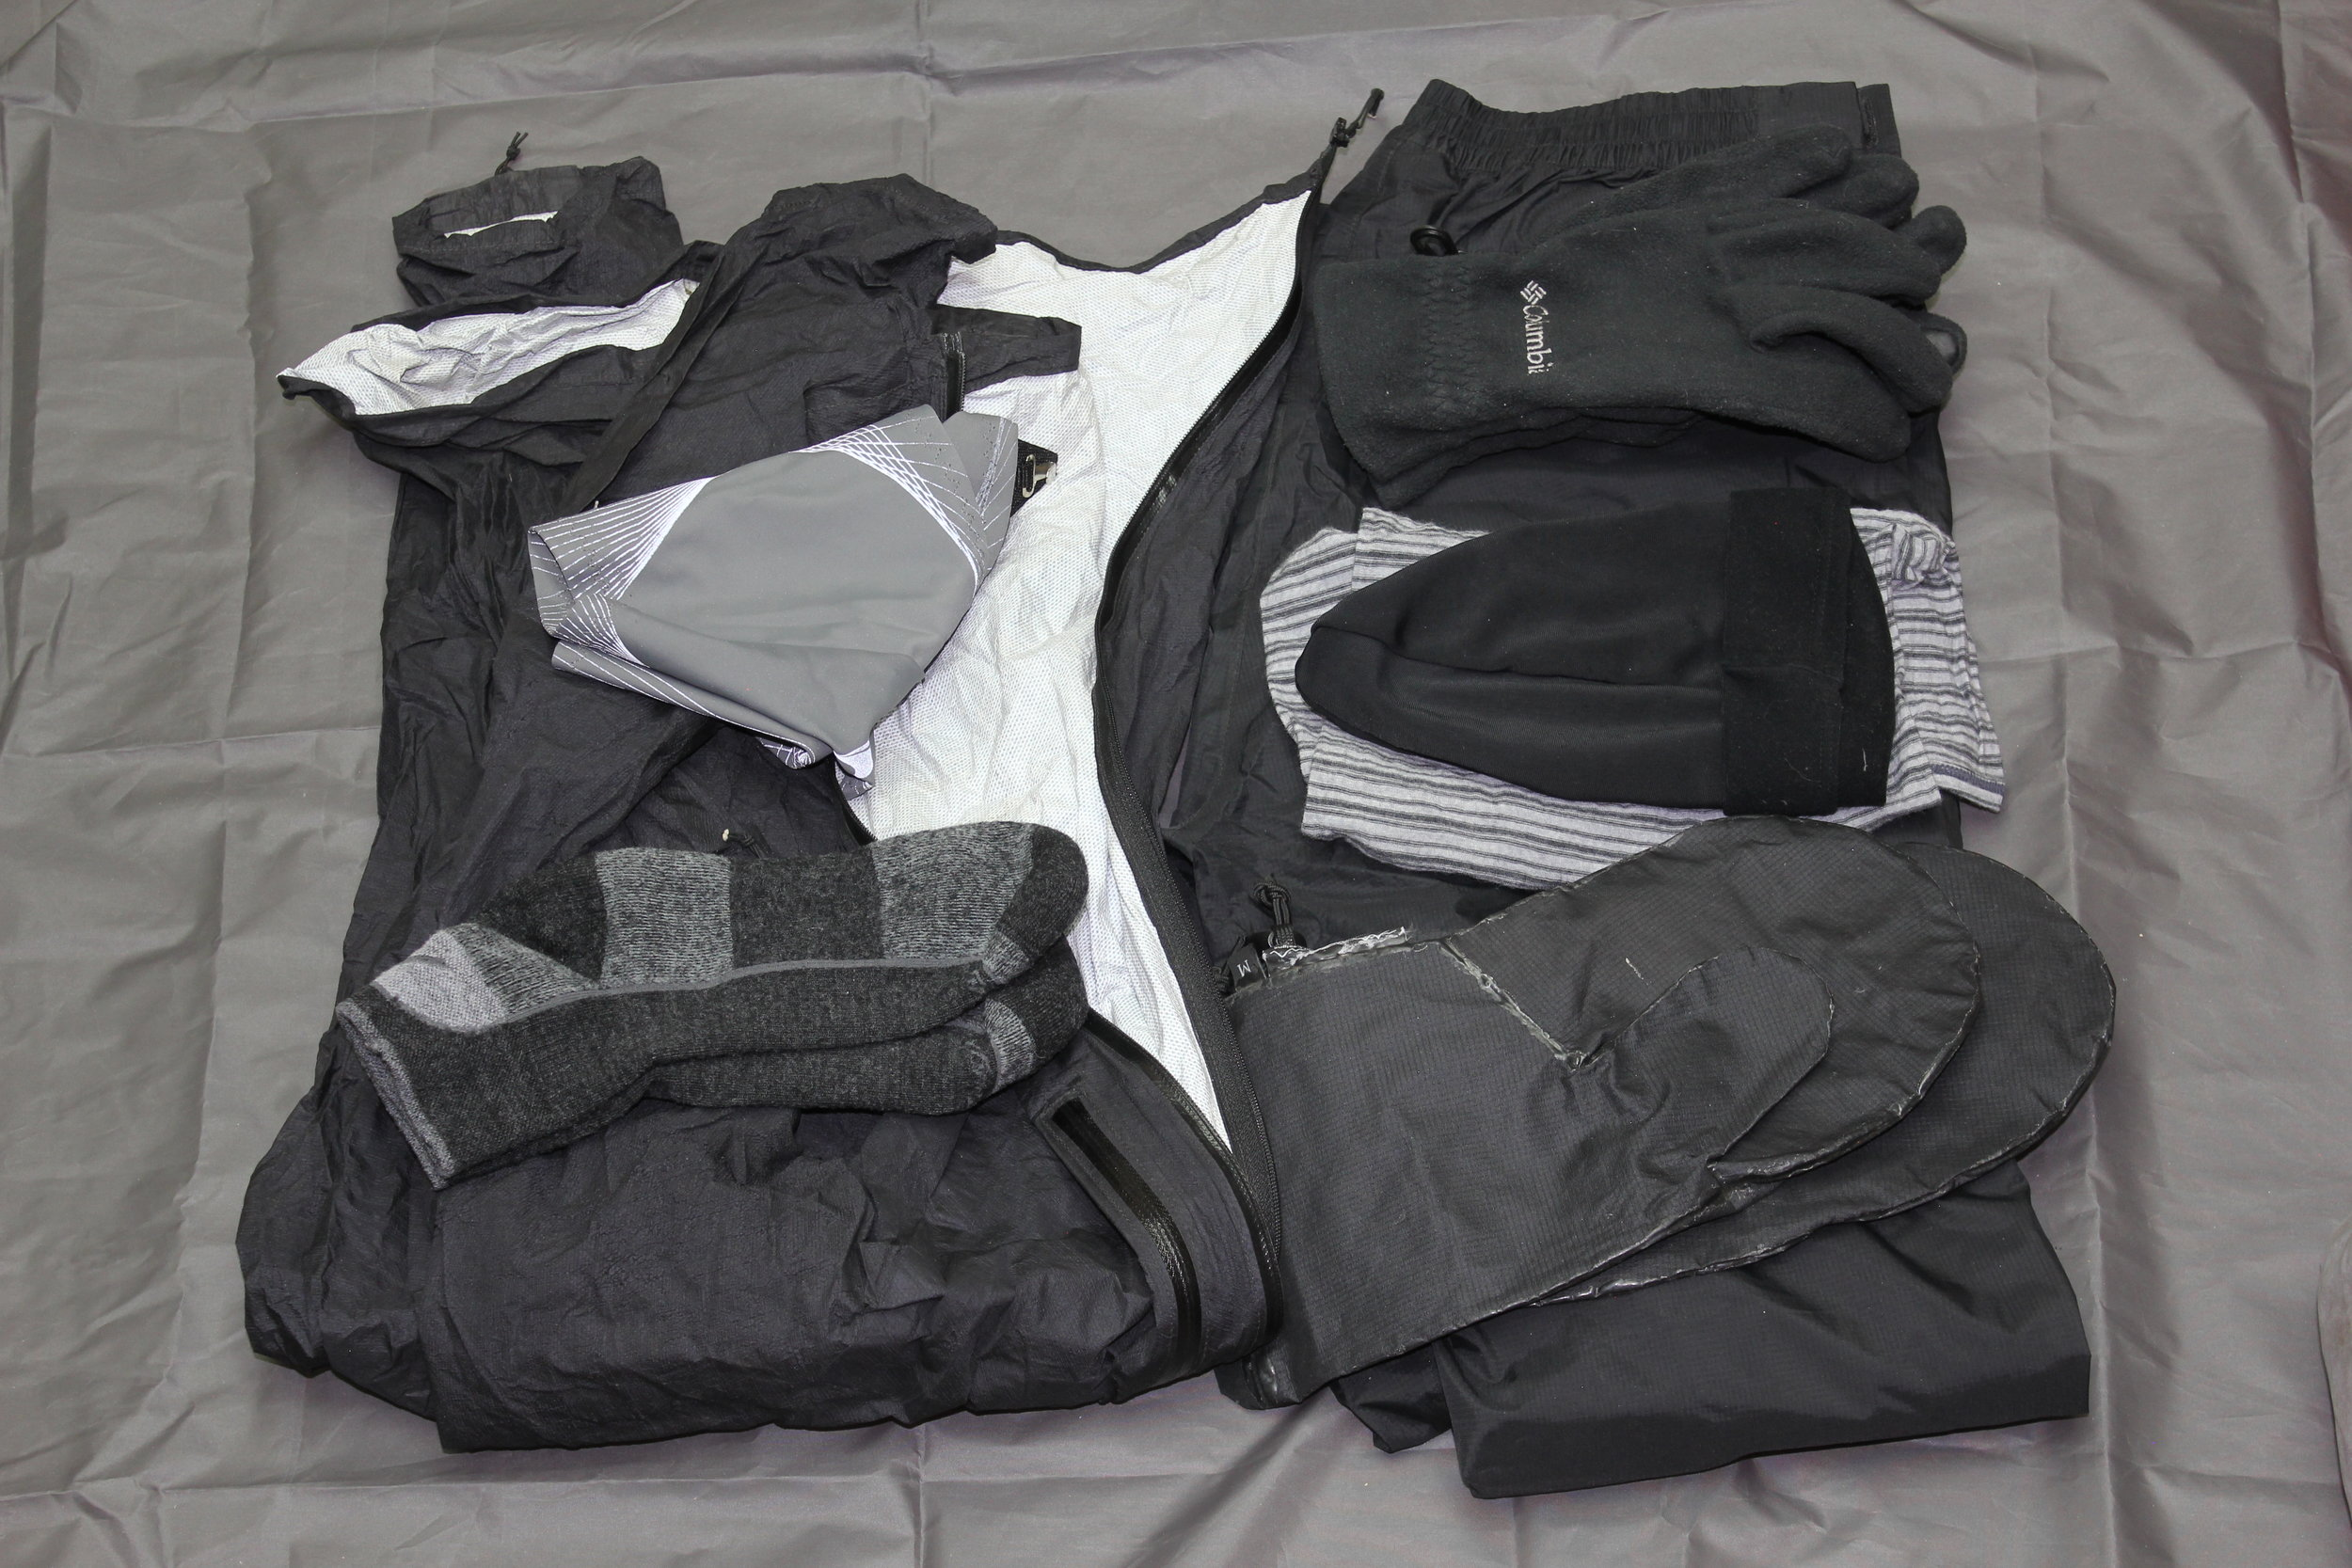 Zpacks Rain Jacket - 6 oz  Marmot PreClip Full-Zip Rain Pants  Altra Gators  Columbia Gloves  Mount Laurel Designs - Rain Mitts  Neck Buff